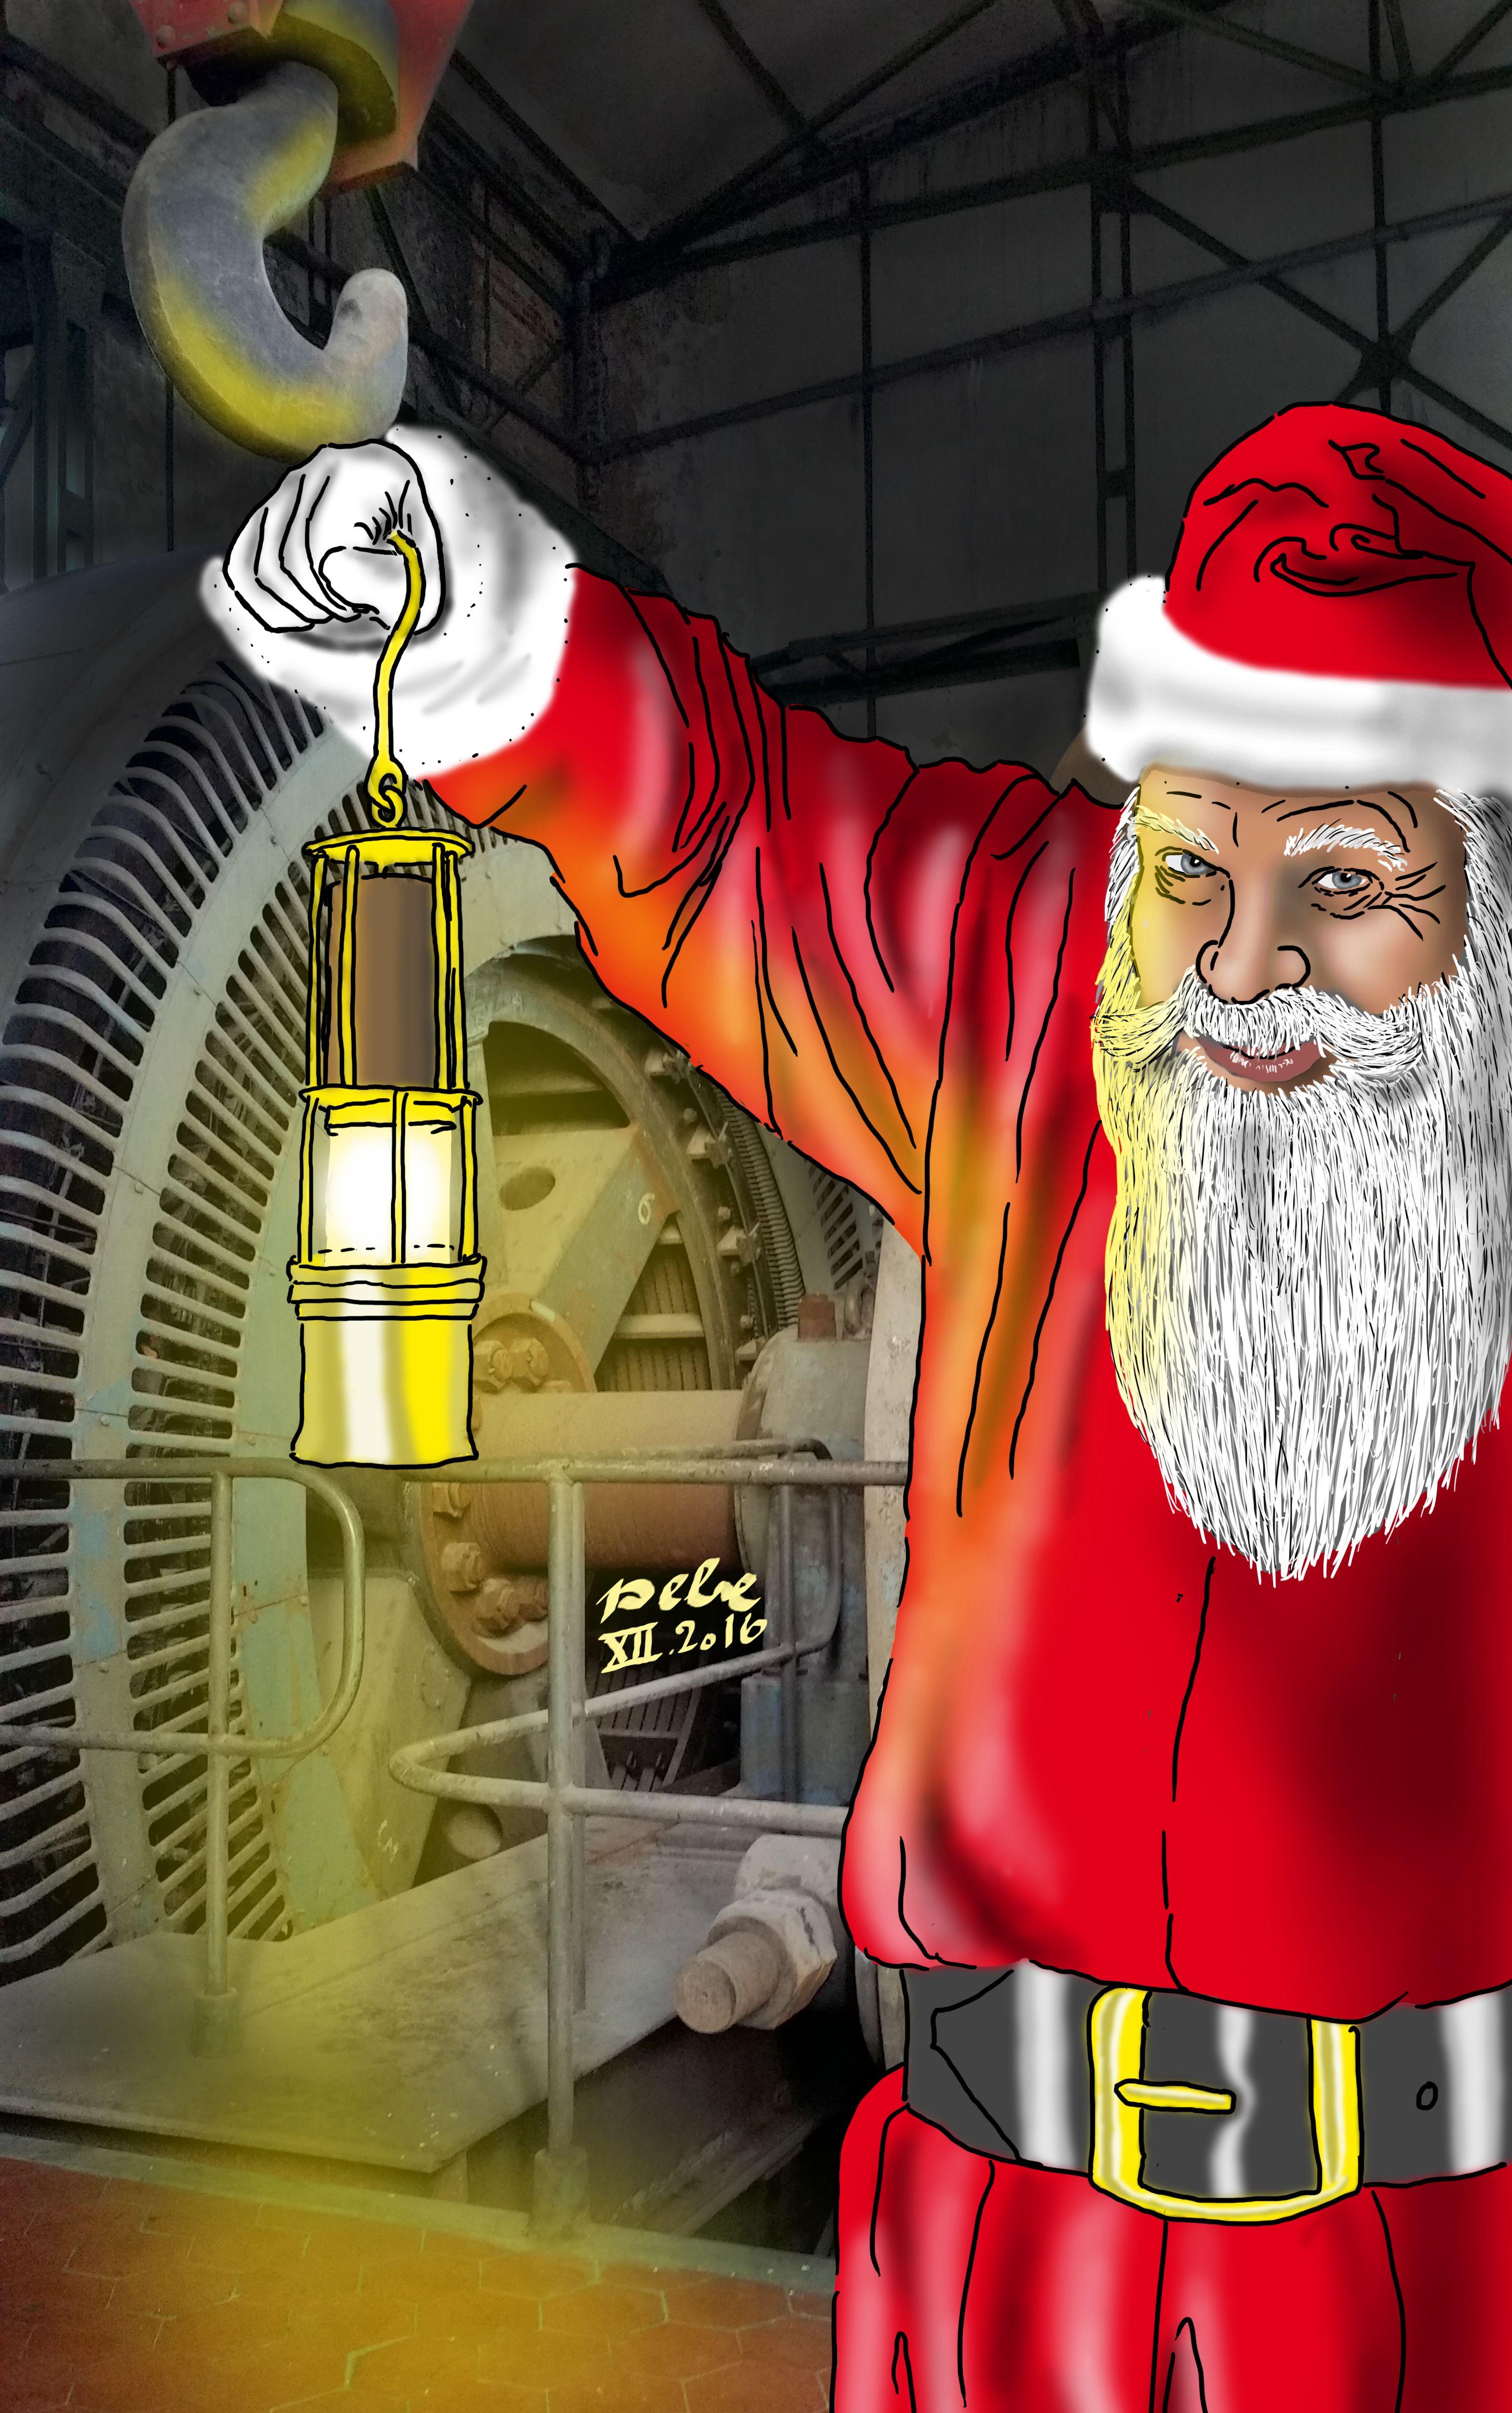 Weihnachtsmann im Förderturm Bönen, Grußkarte